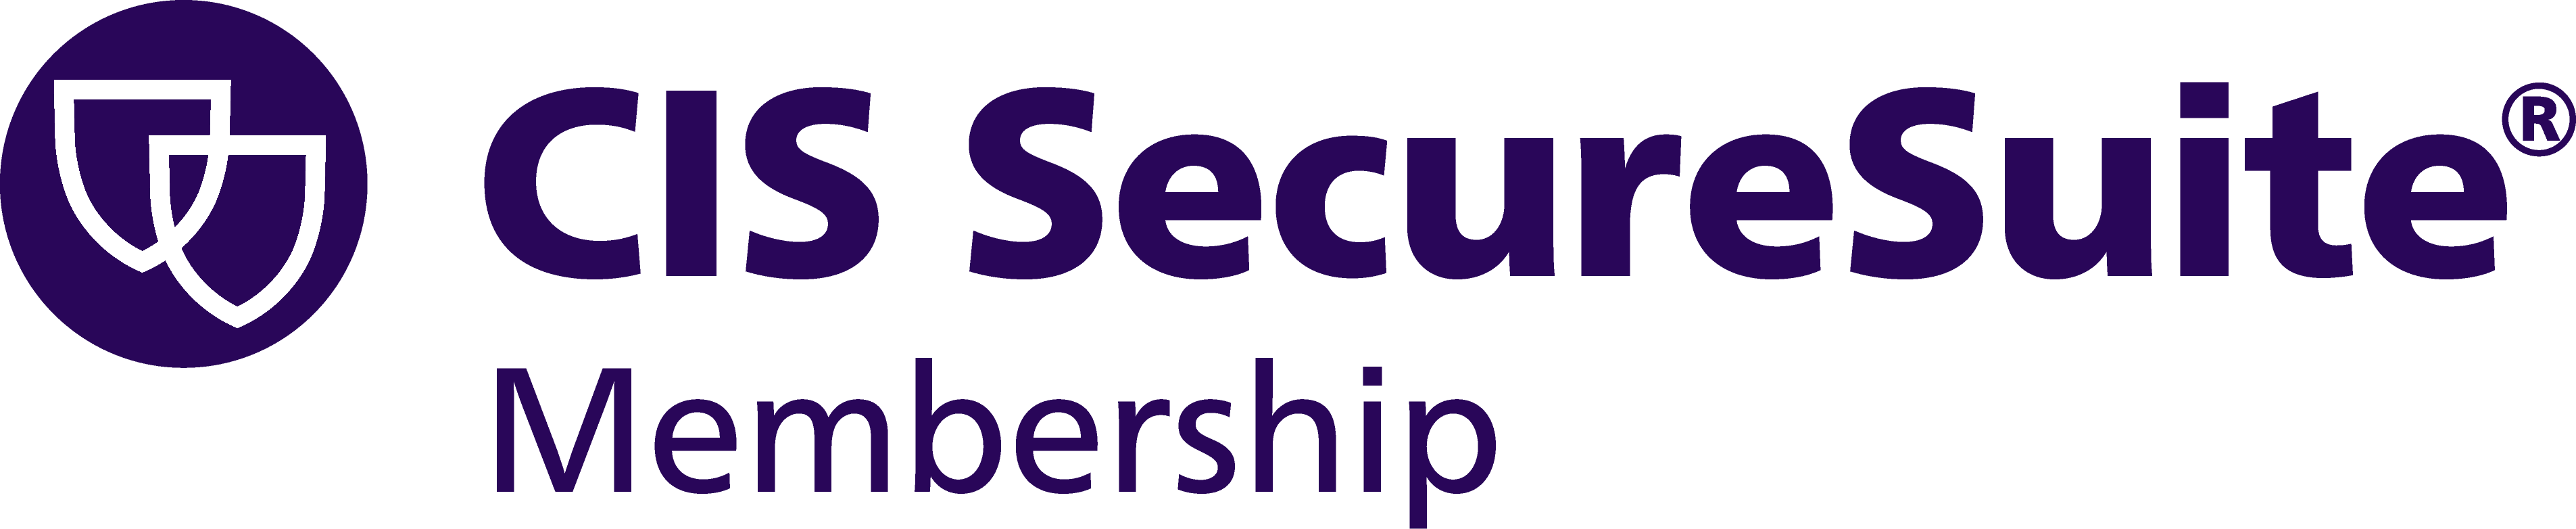 Logo of CIS SecureSuite Membership, an award won by Refactr